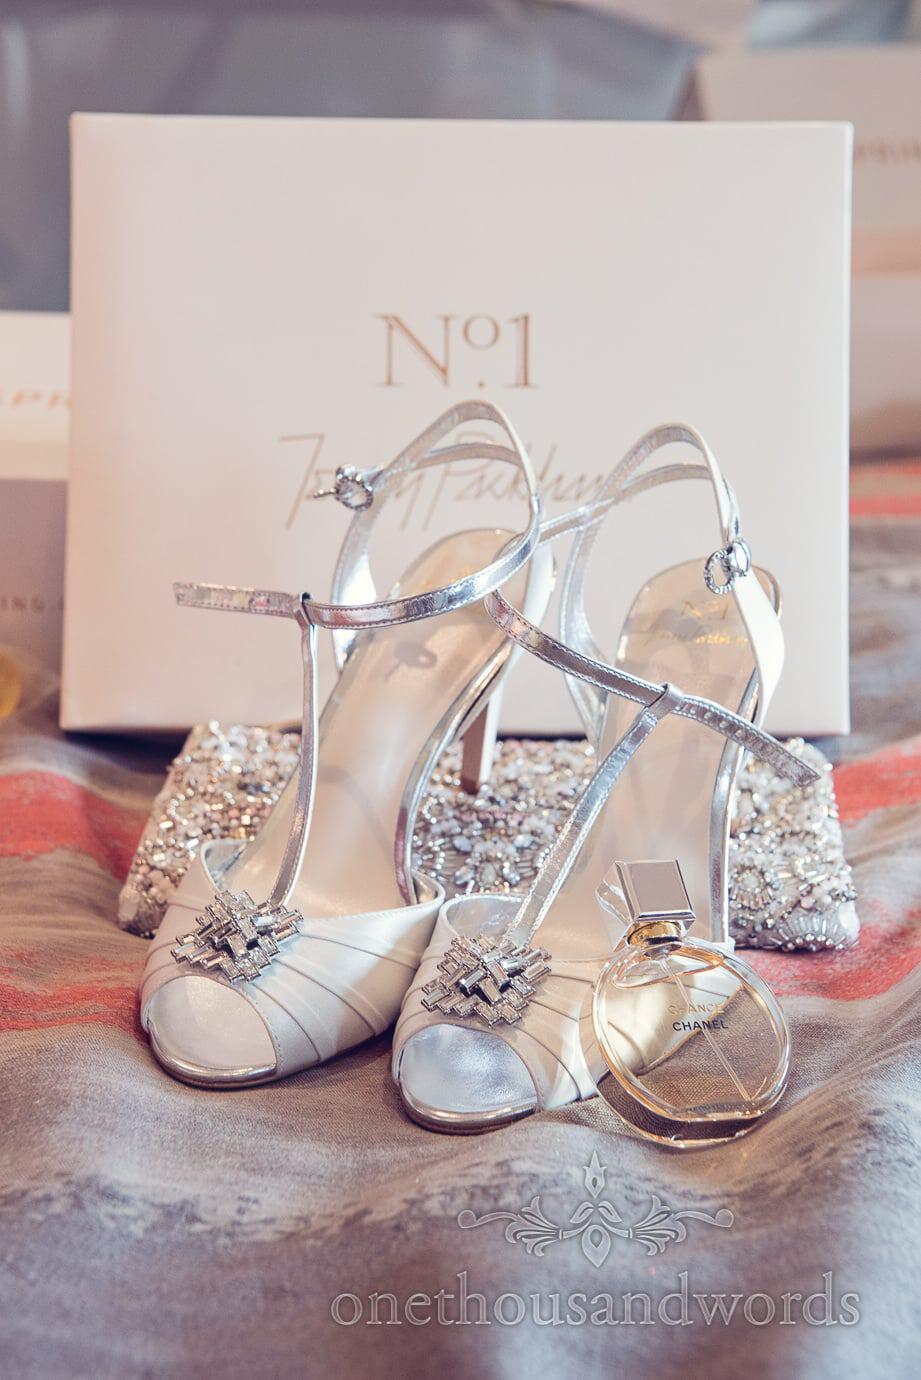 Jenny Packham Wedding shoes with Chanel Perfume